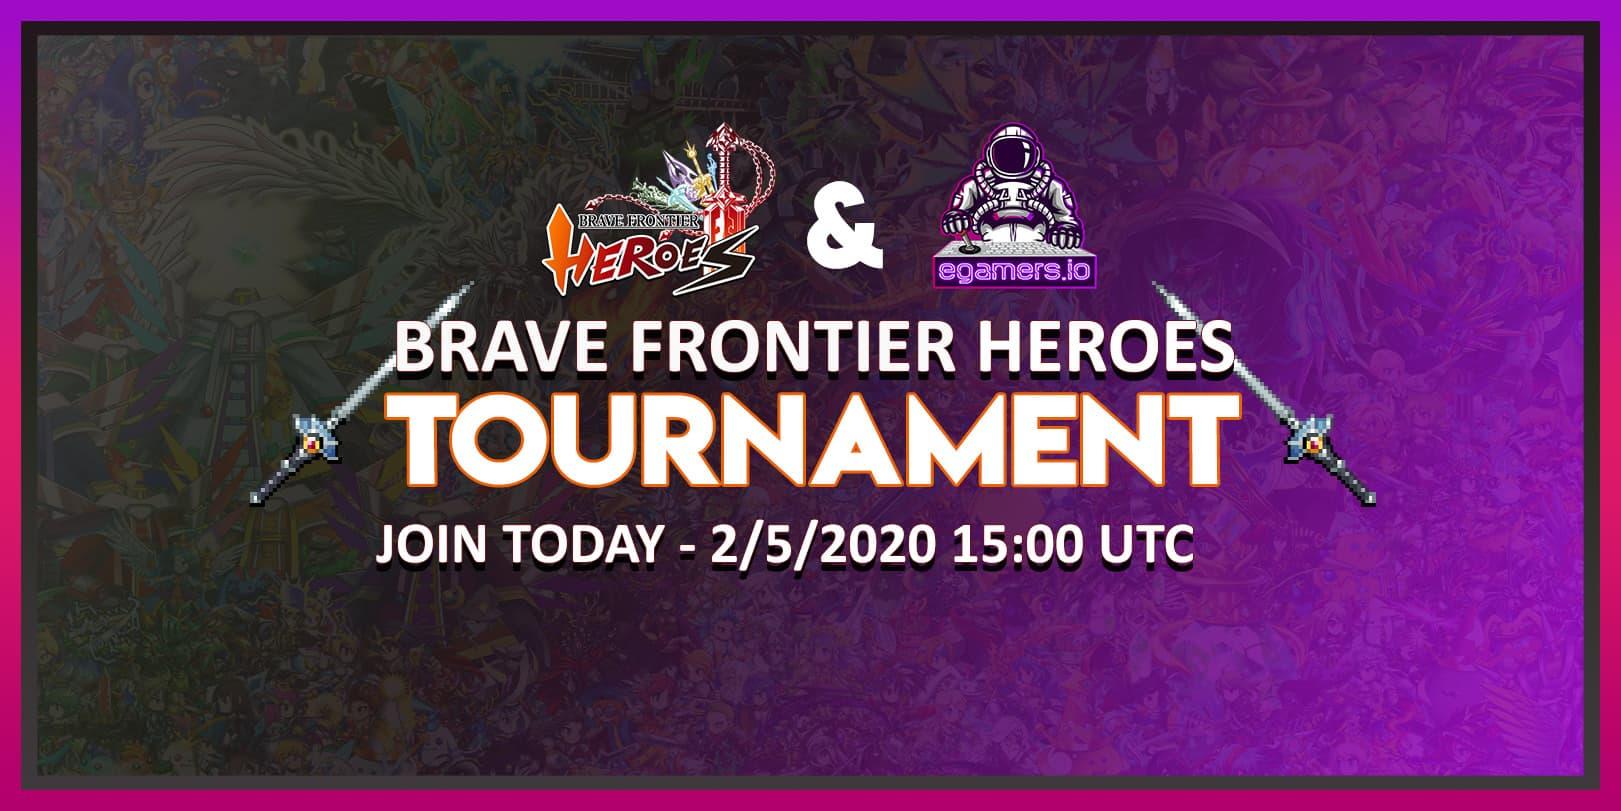 bfh tournament